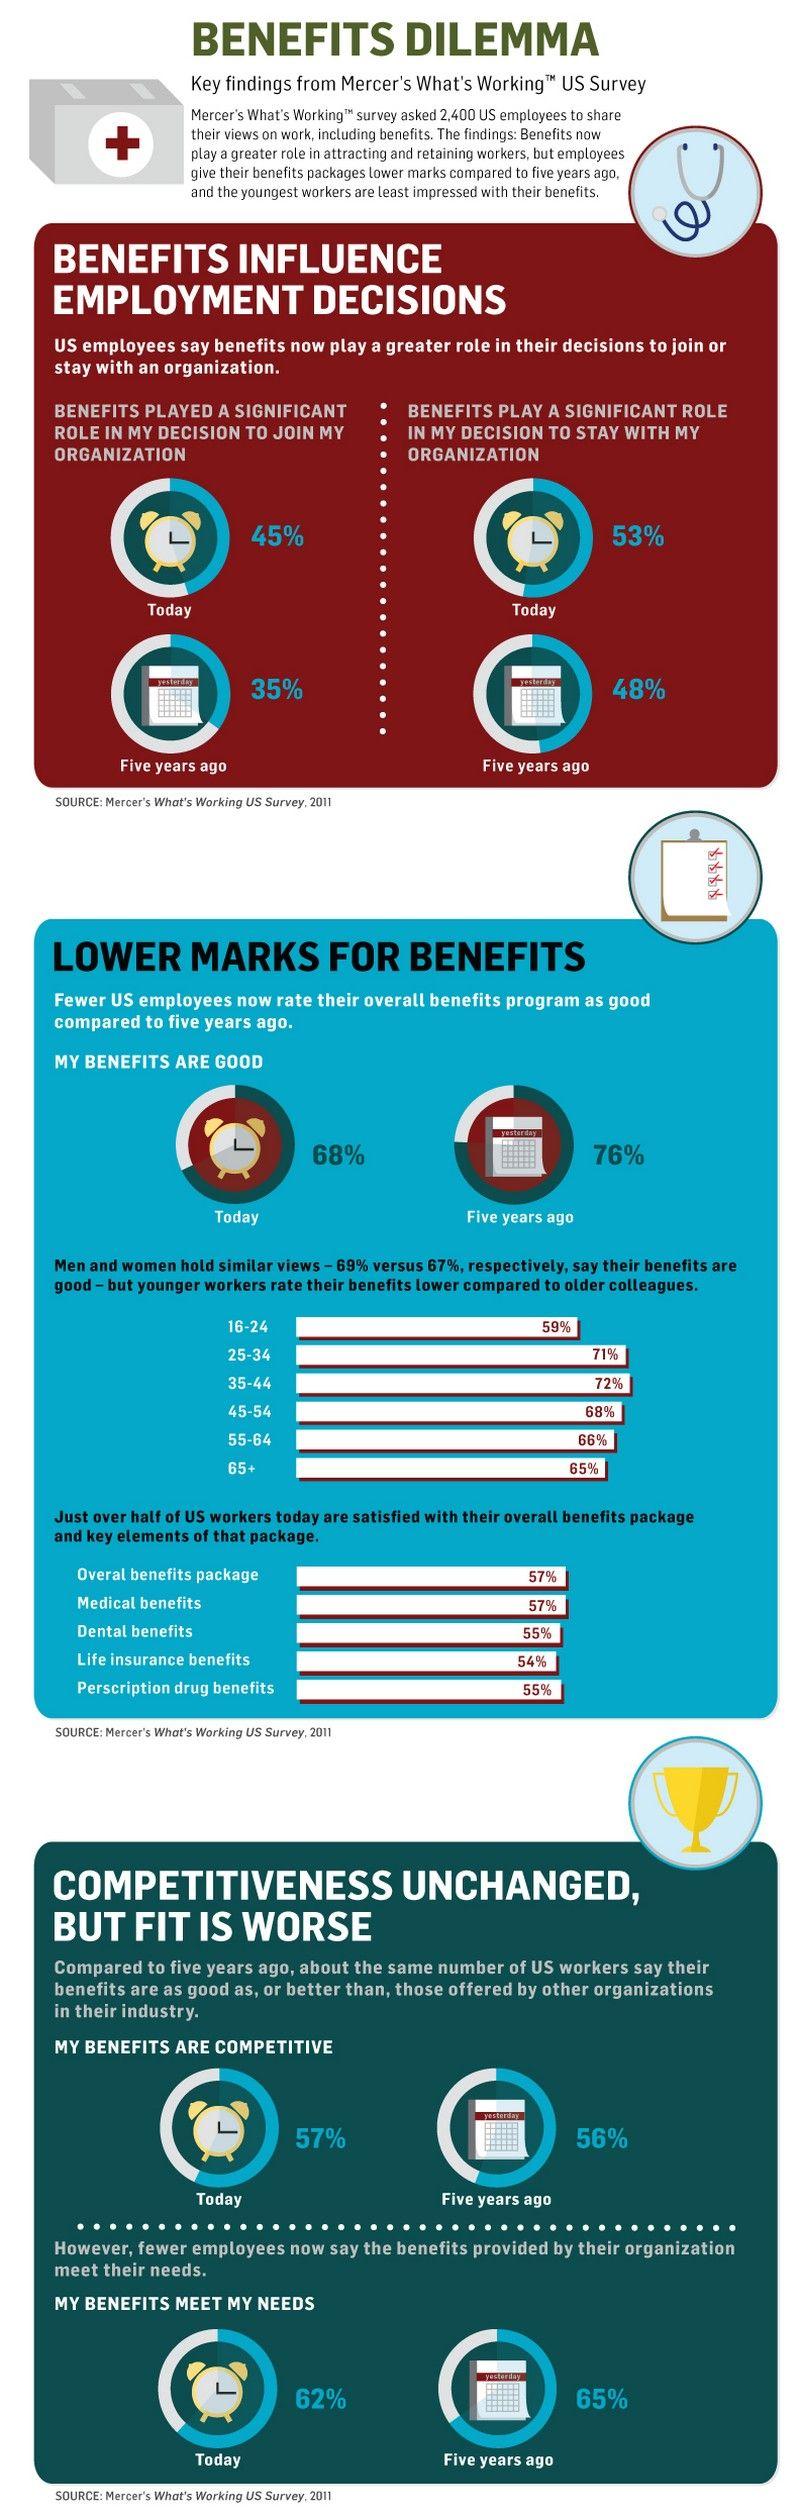 Benefits dilemma benefit program